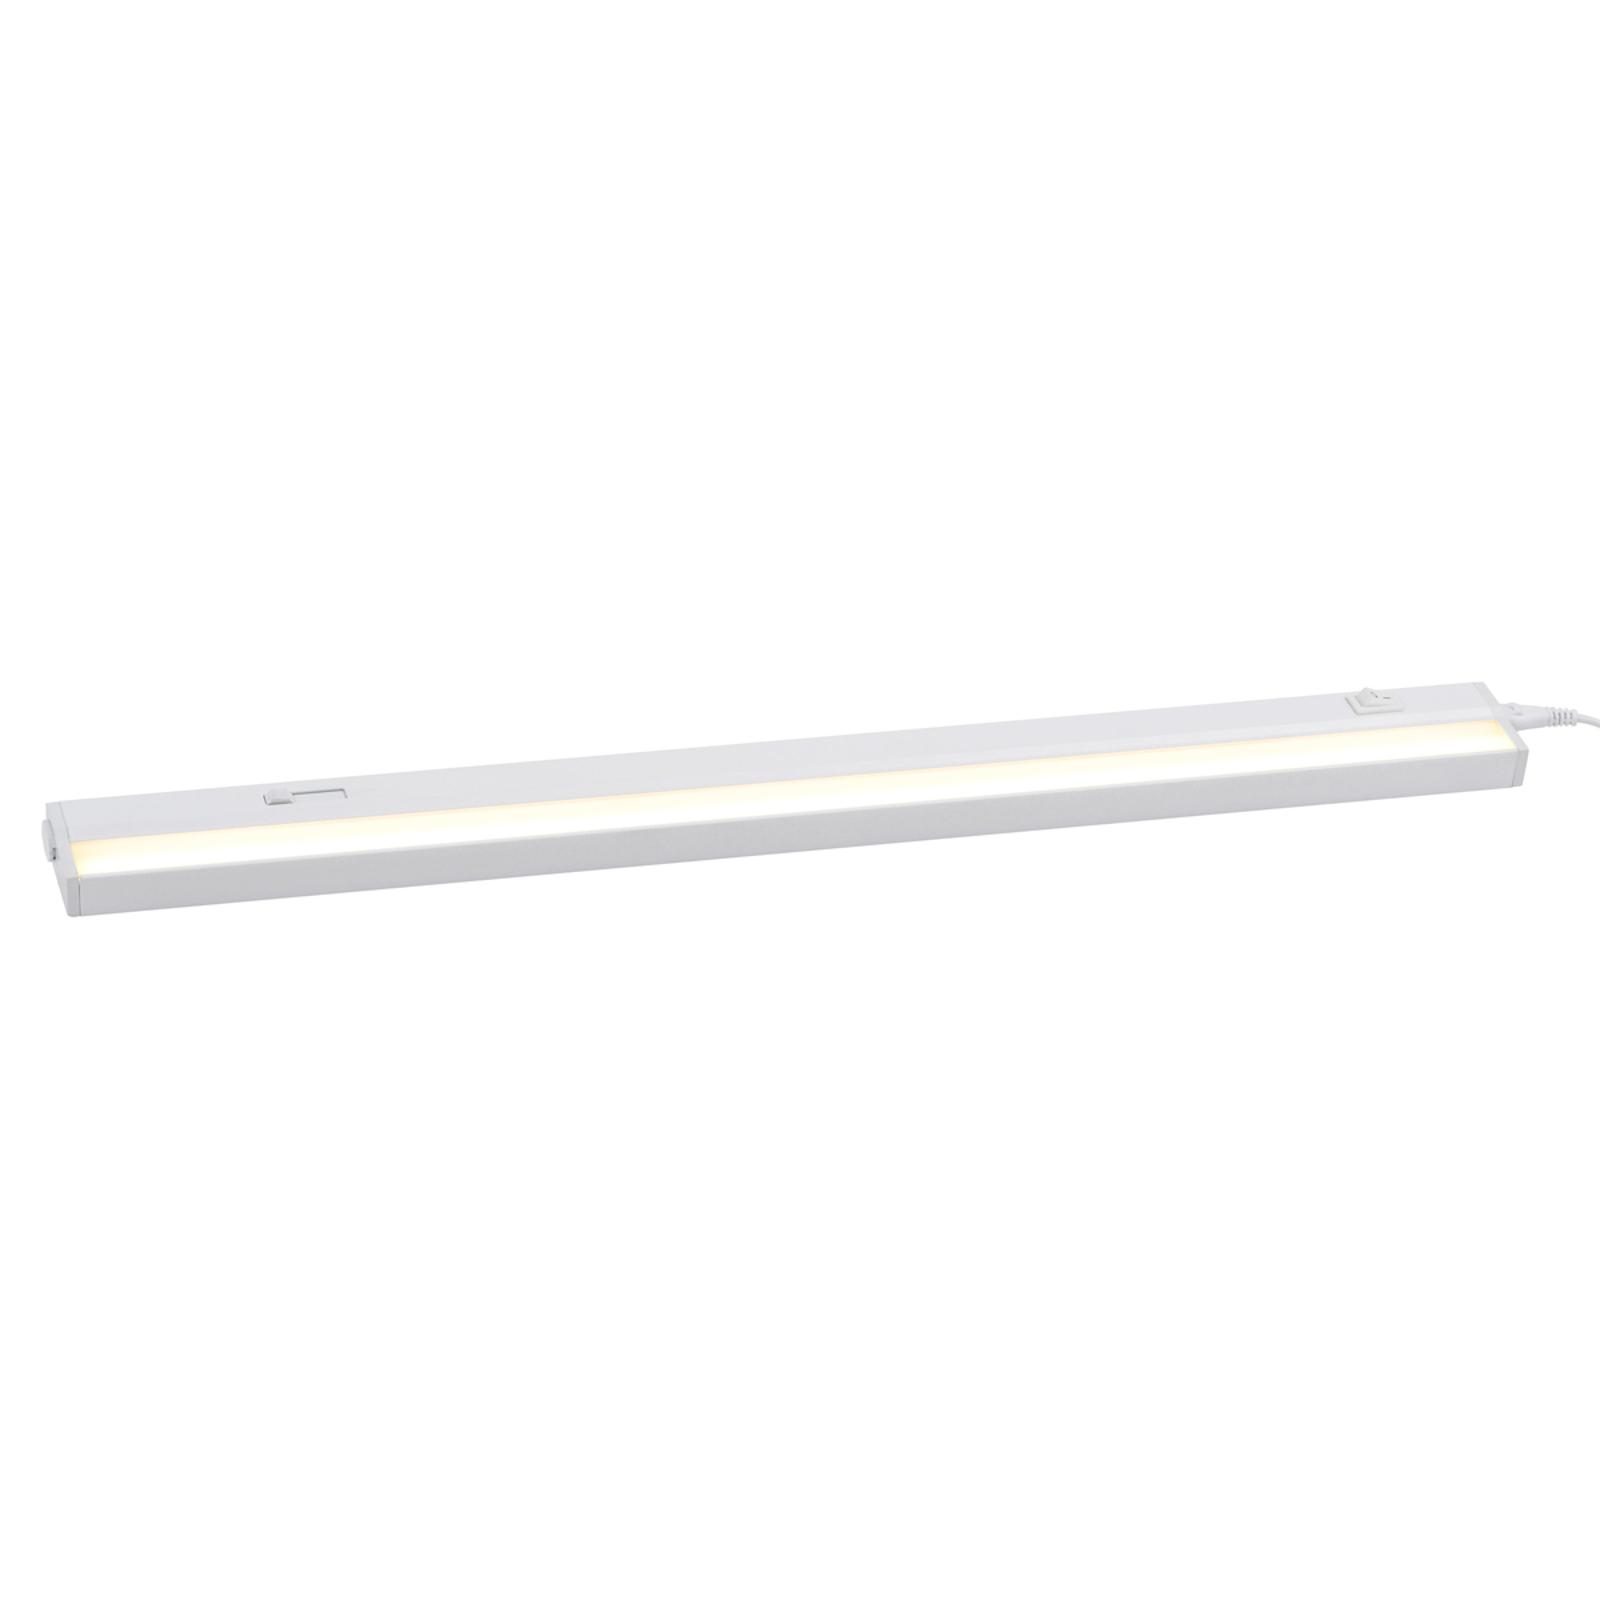 Lampada LED sottopensile Cabinet Light 60,9 cm